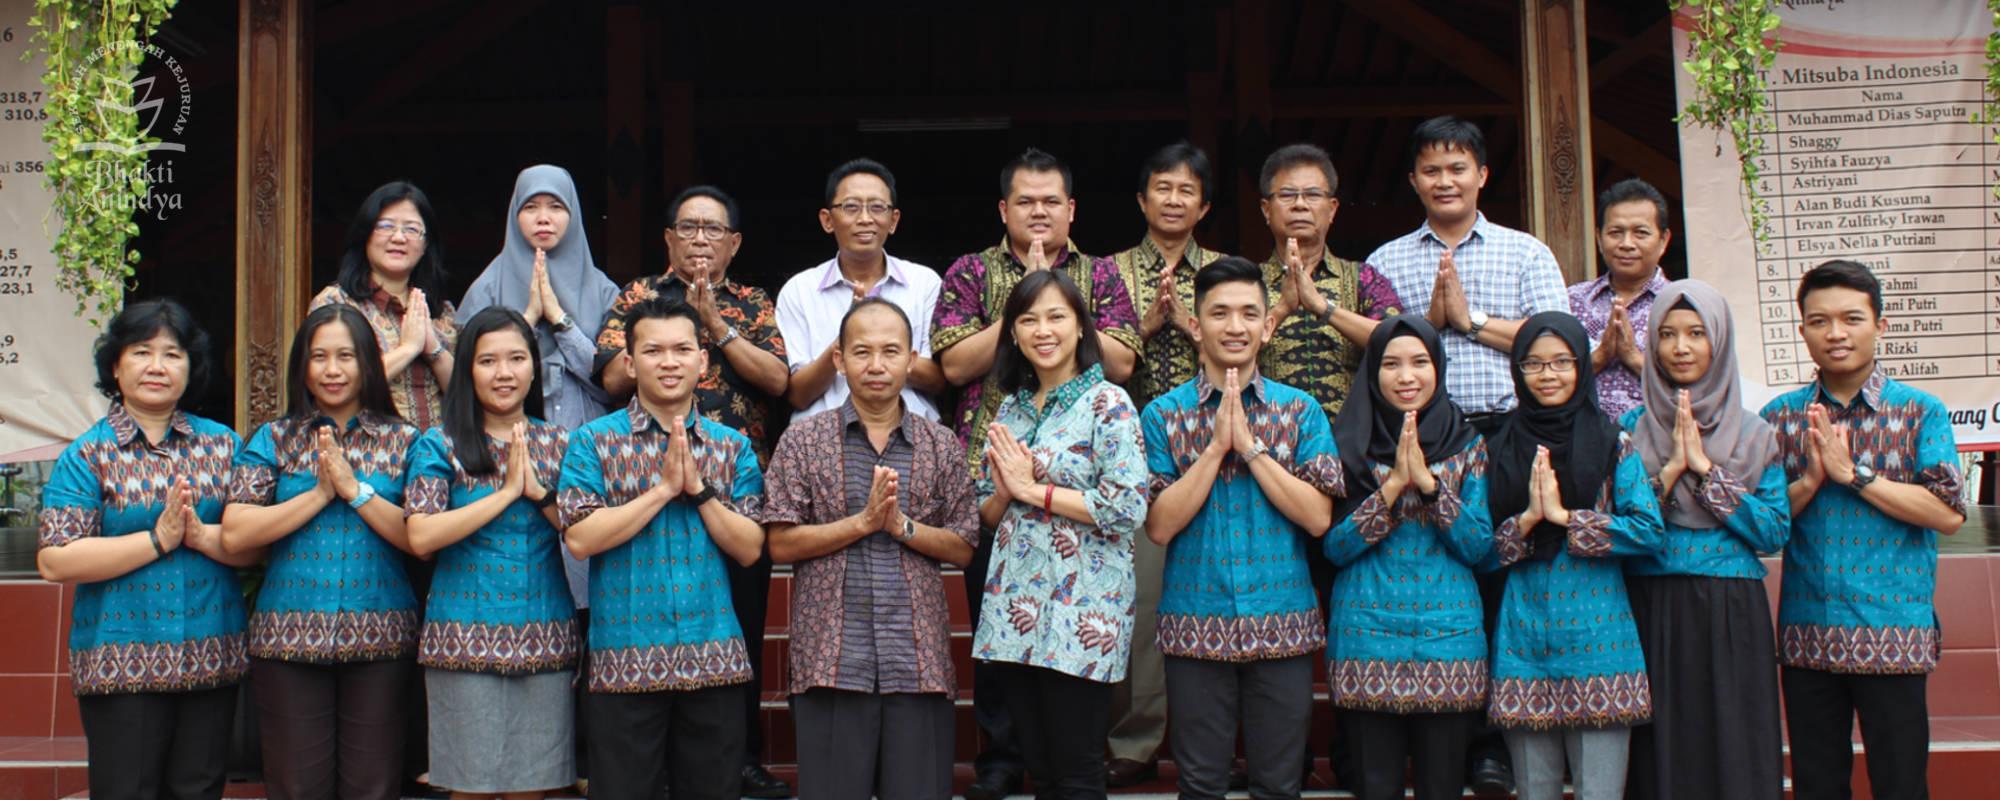 Selamat Hari Raya Idul Fitri 1437 H - SMK Bhakti Anindya Tangerang